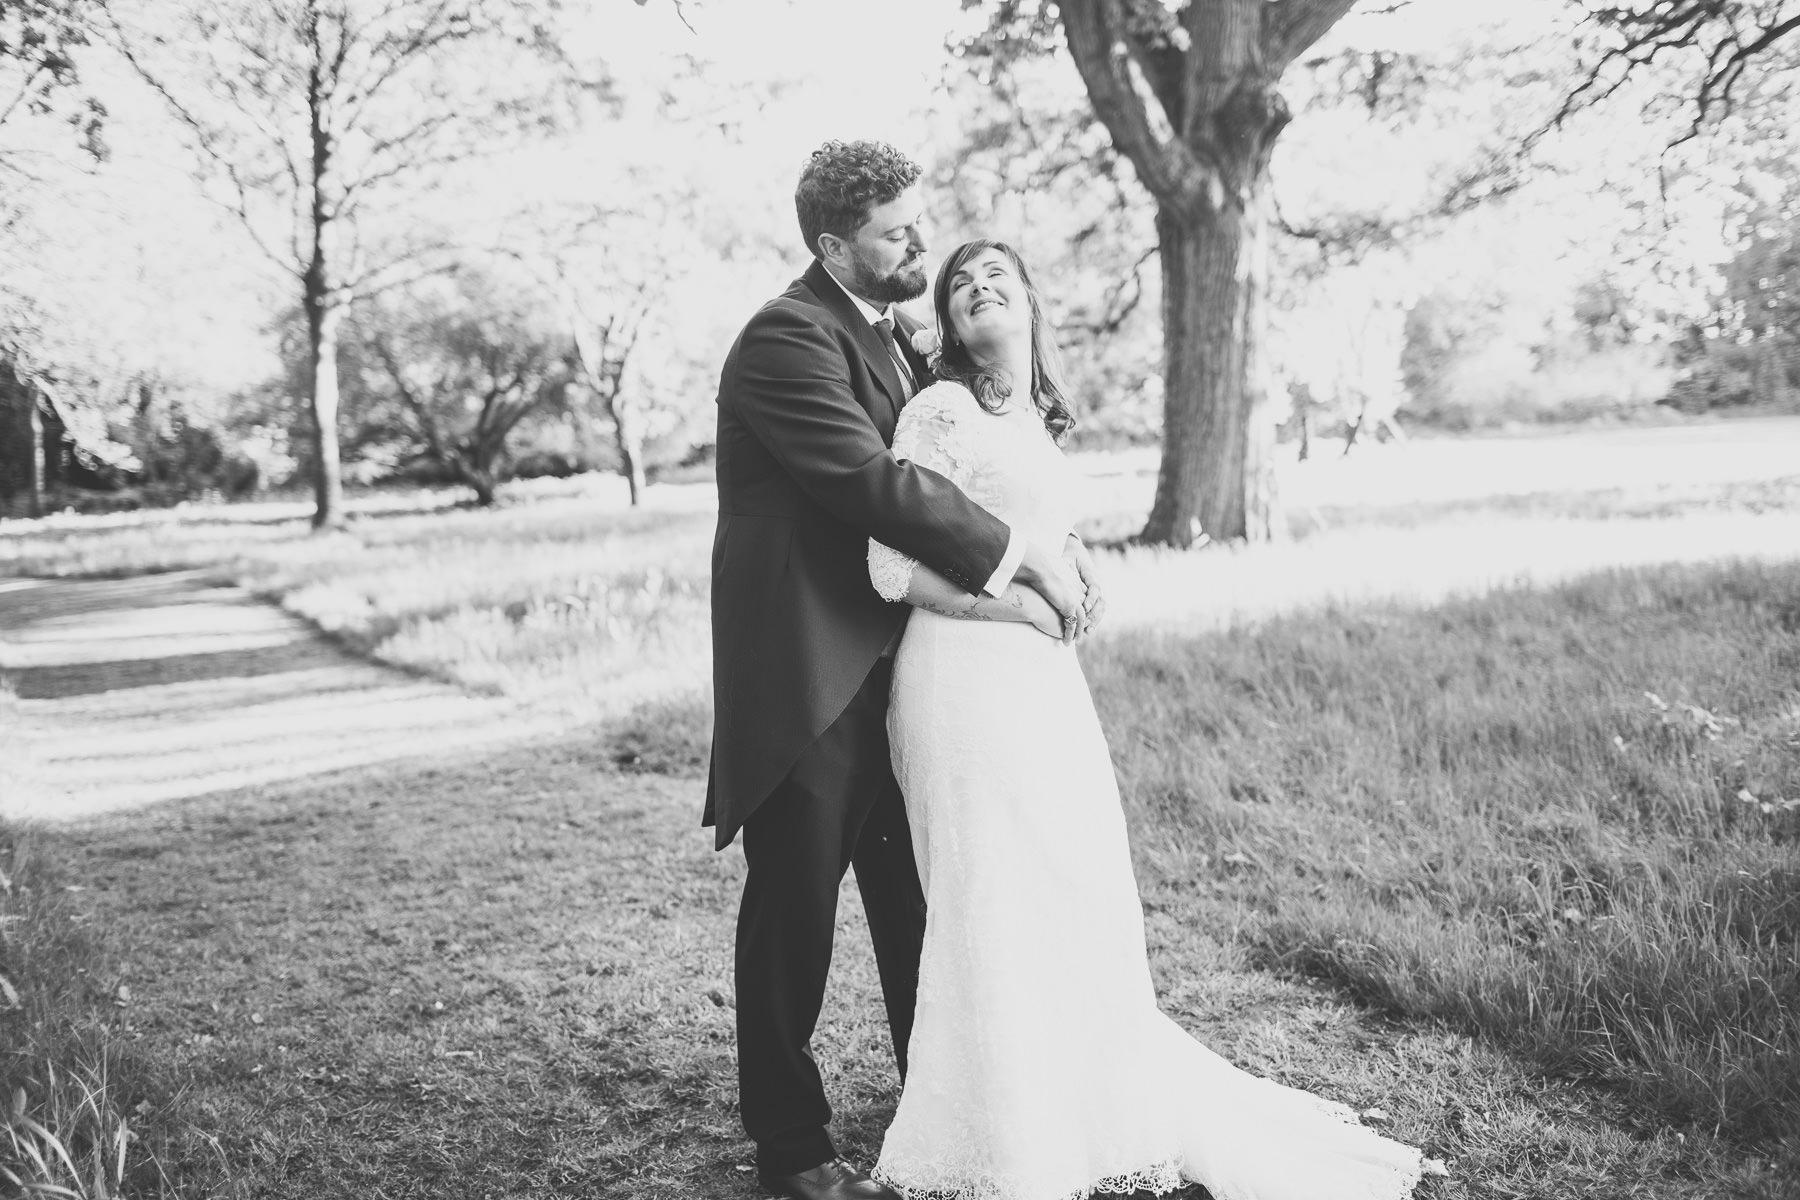 Pamber-Place-wedding-photography-basingstoke-hampshire-191